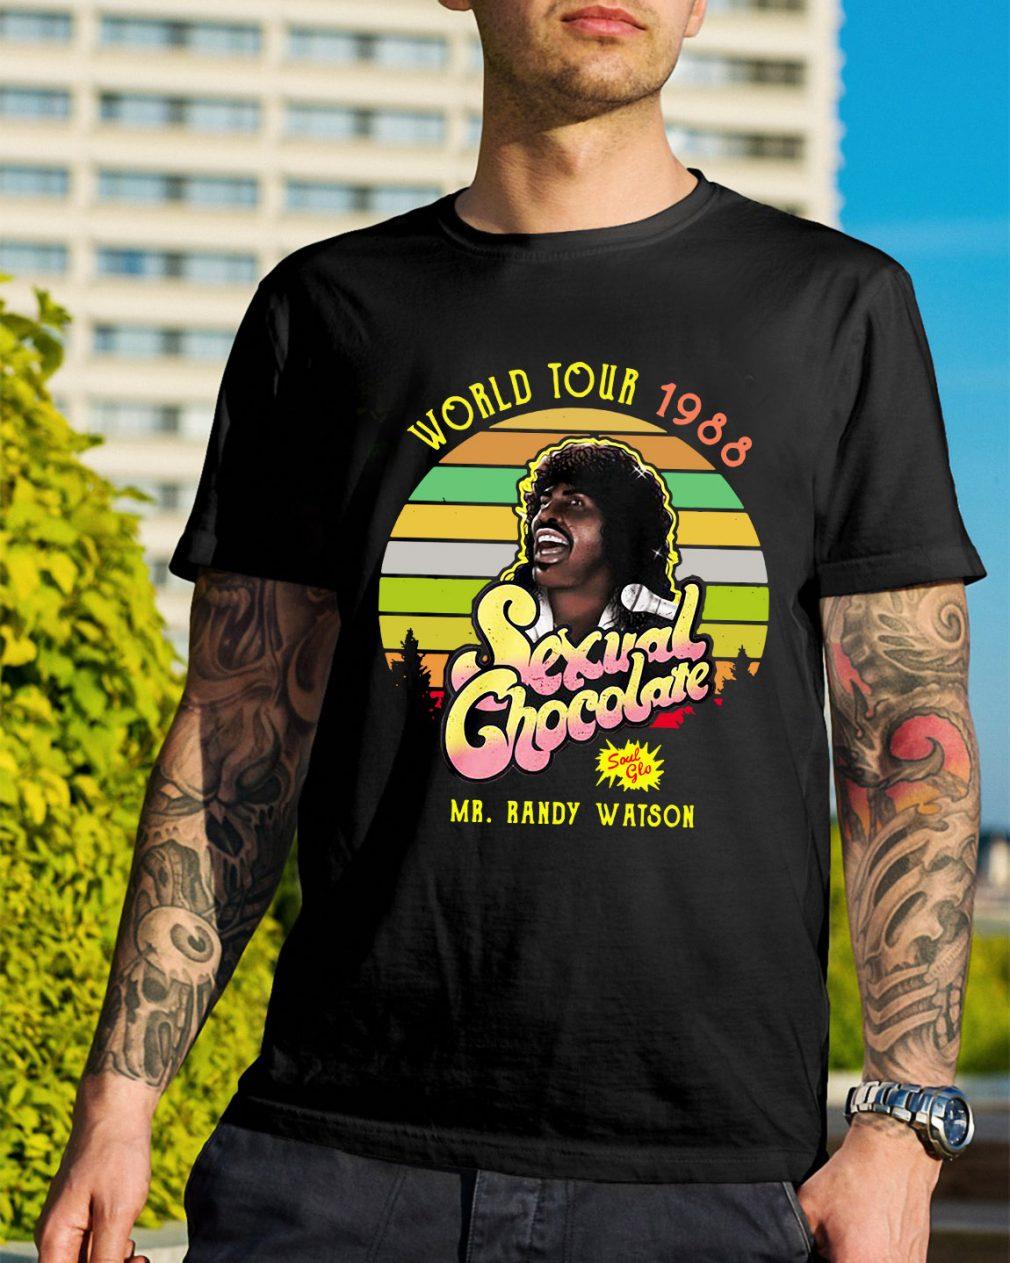 World tour 1988 Sexual Chocolate Mr. Randy Watson vintage shirt